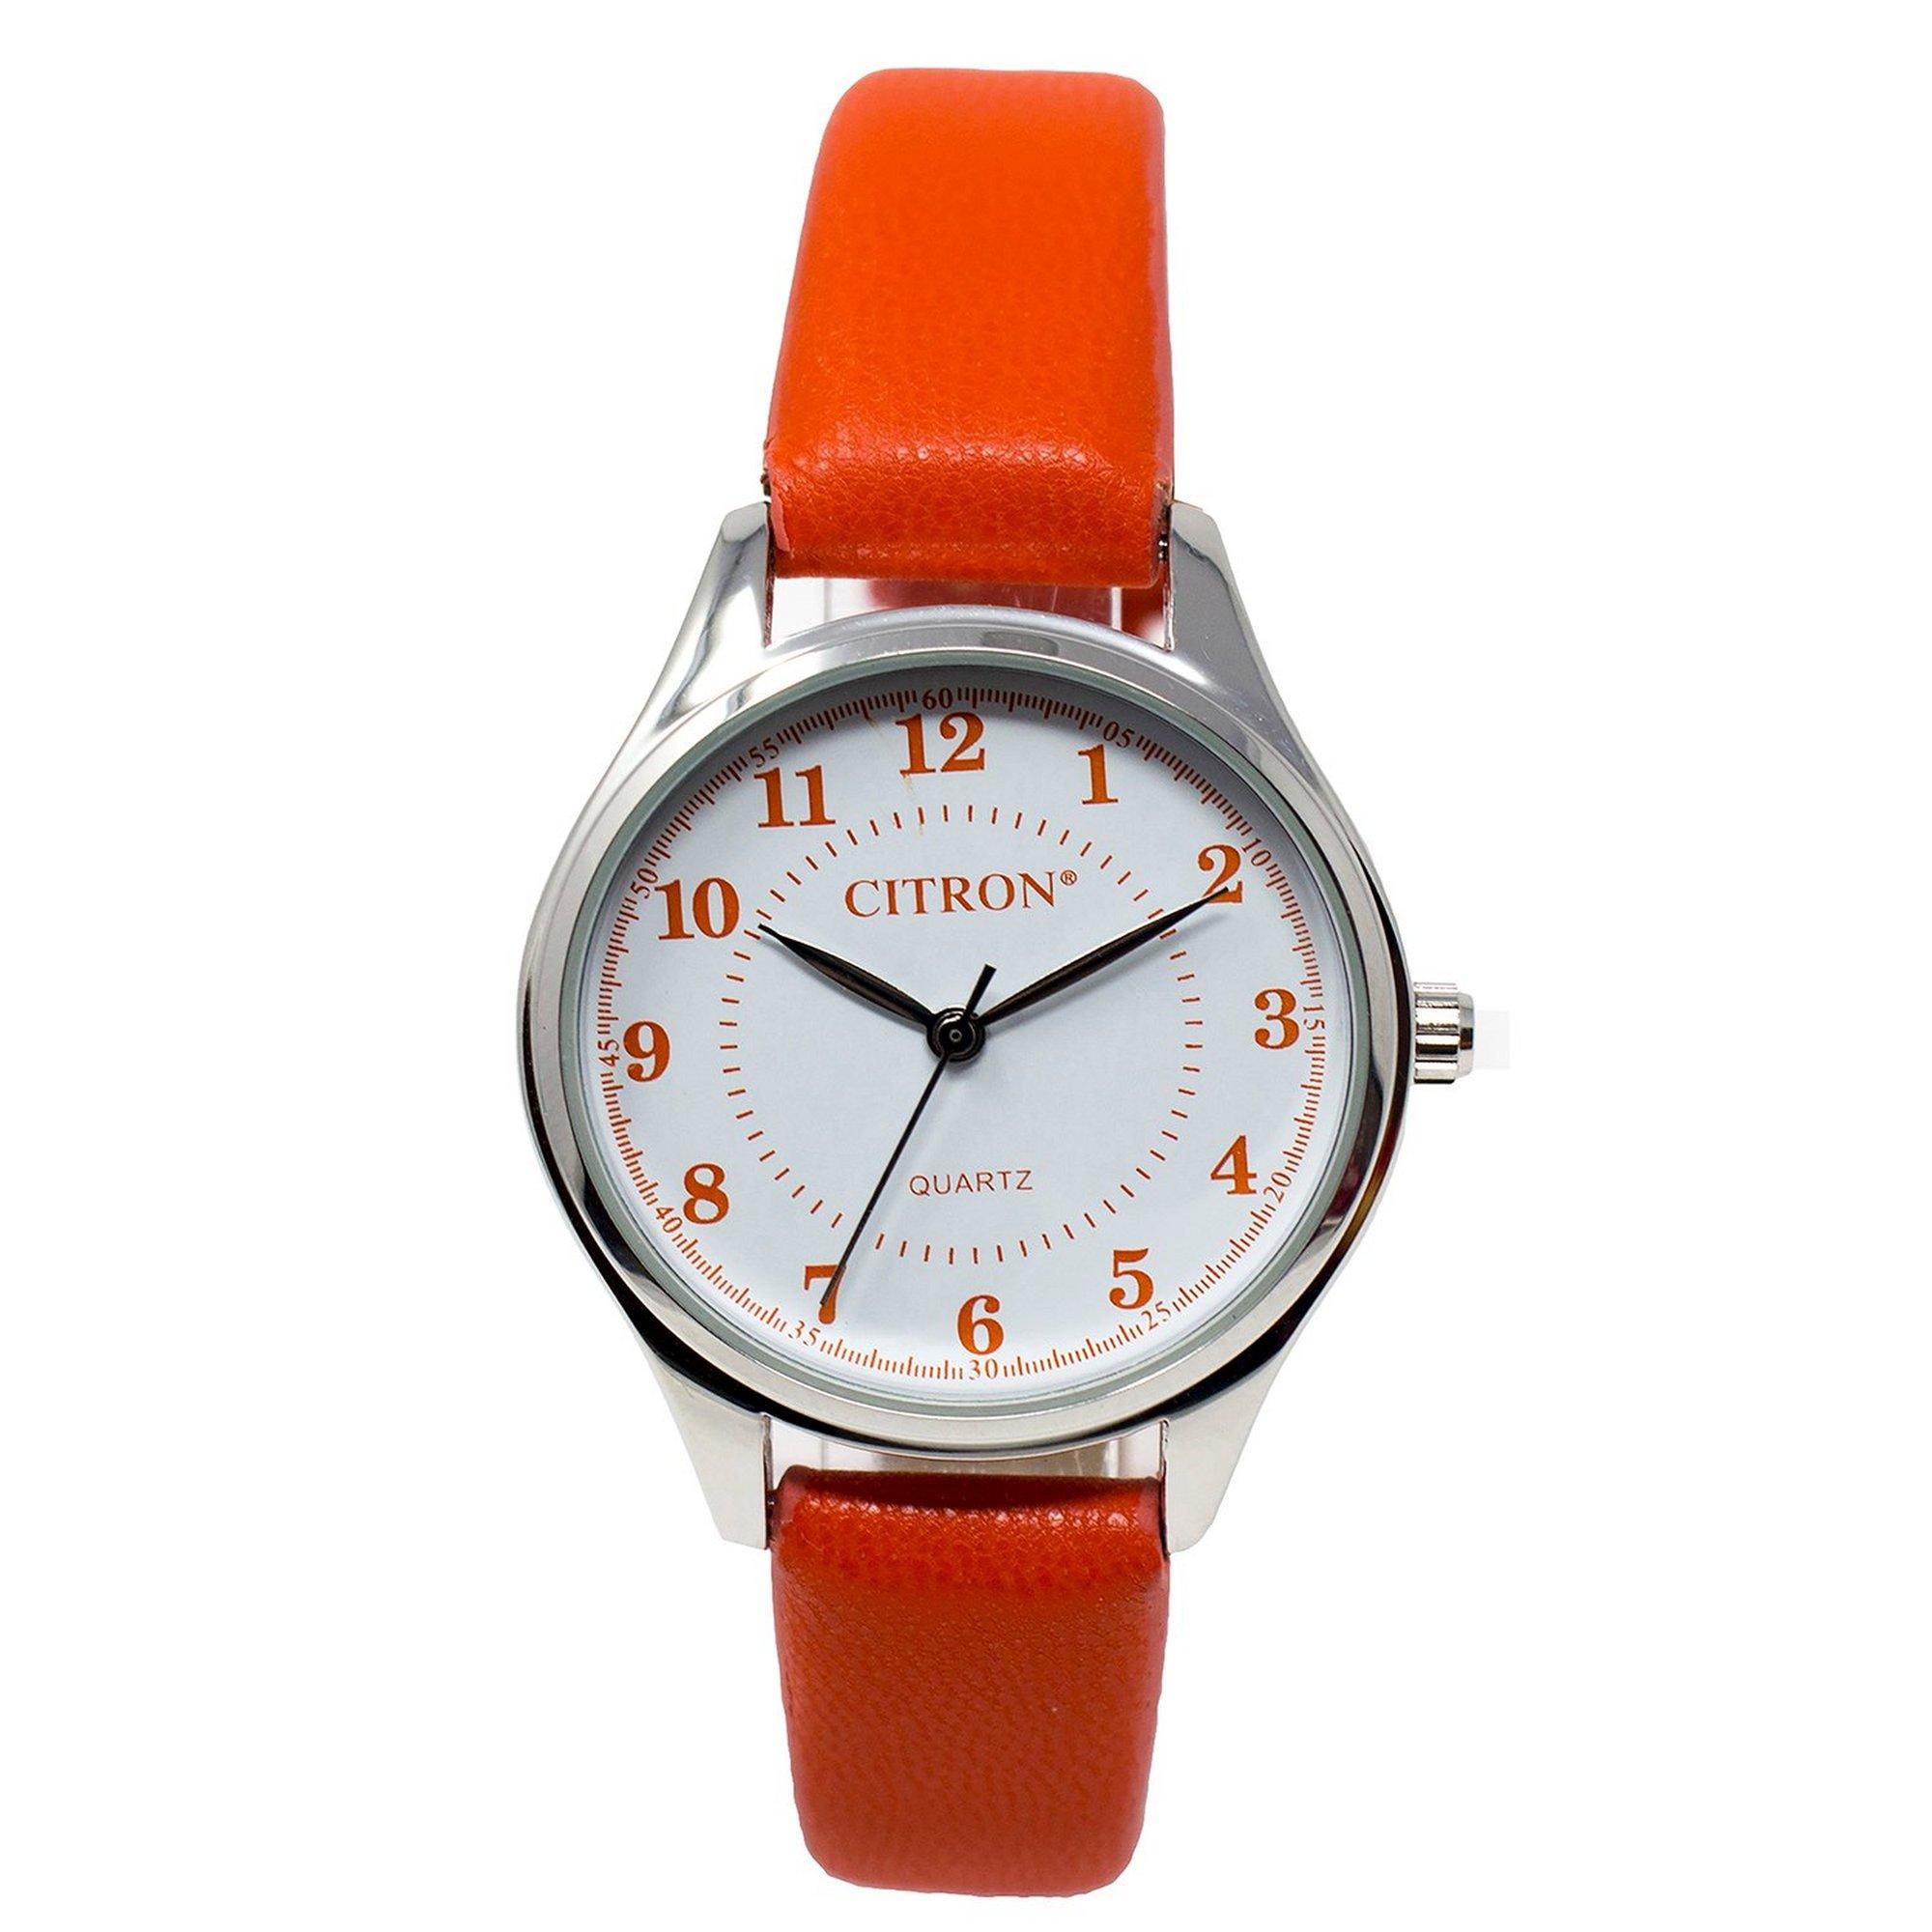 Image of Citron Orange Strap Analogue Watch